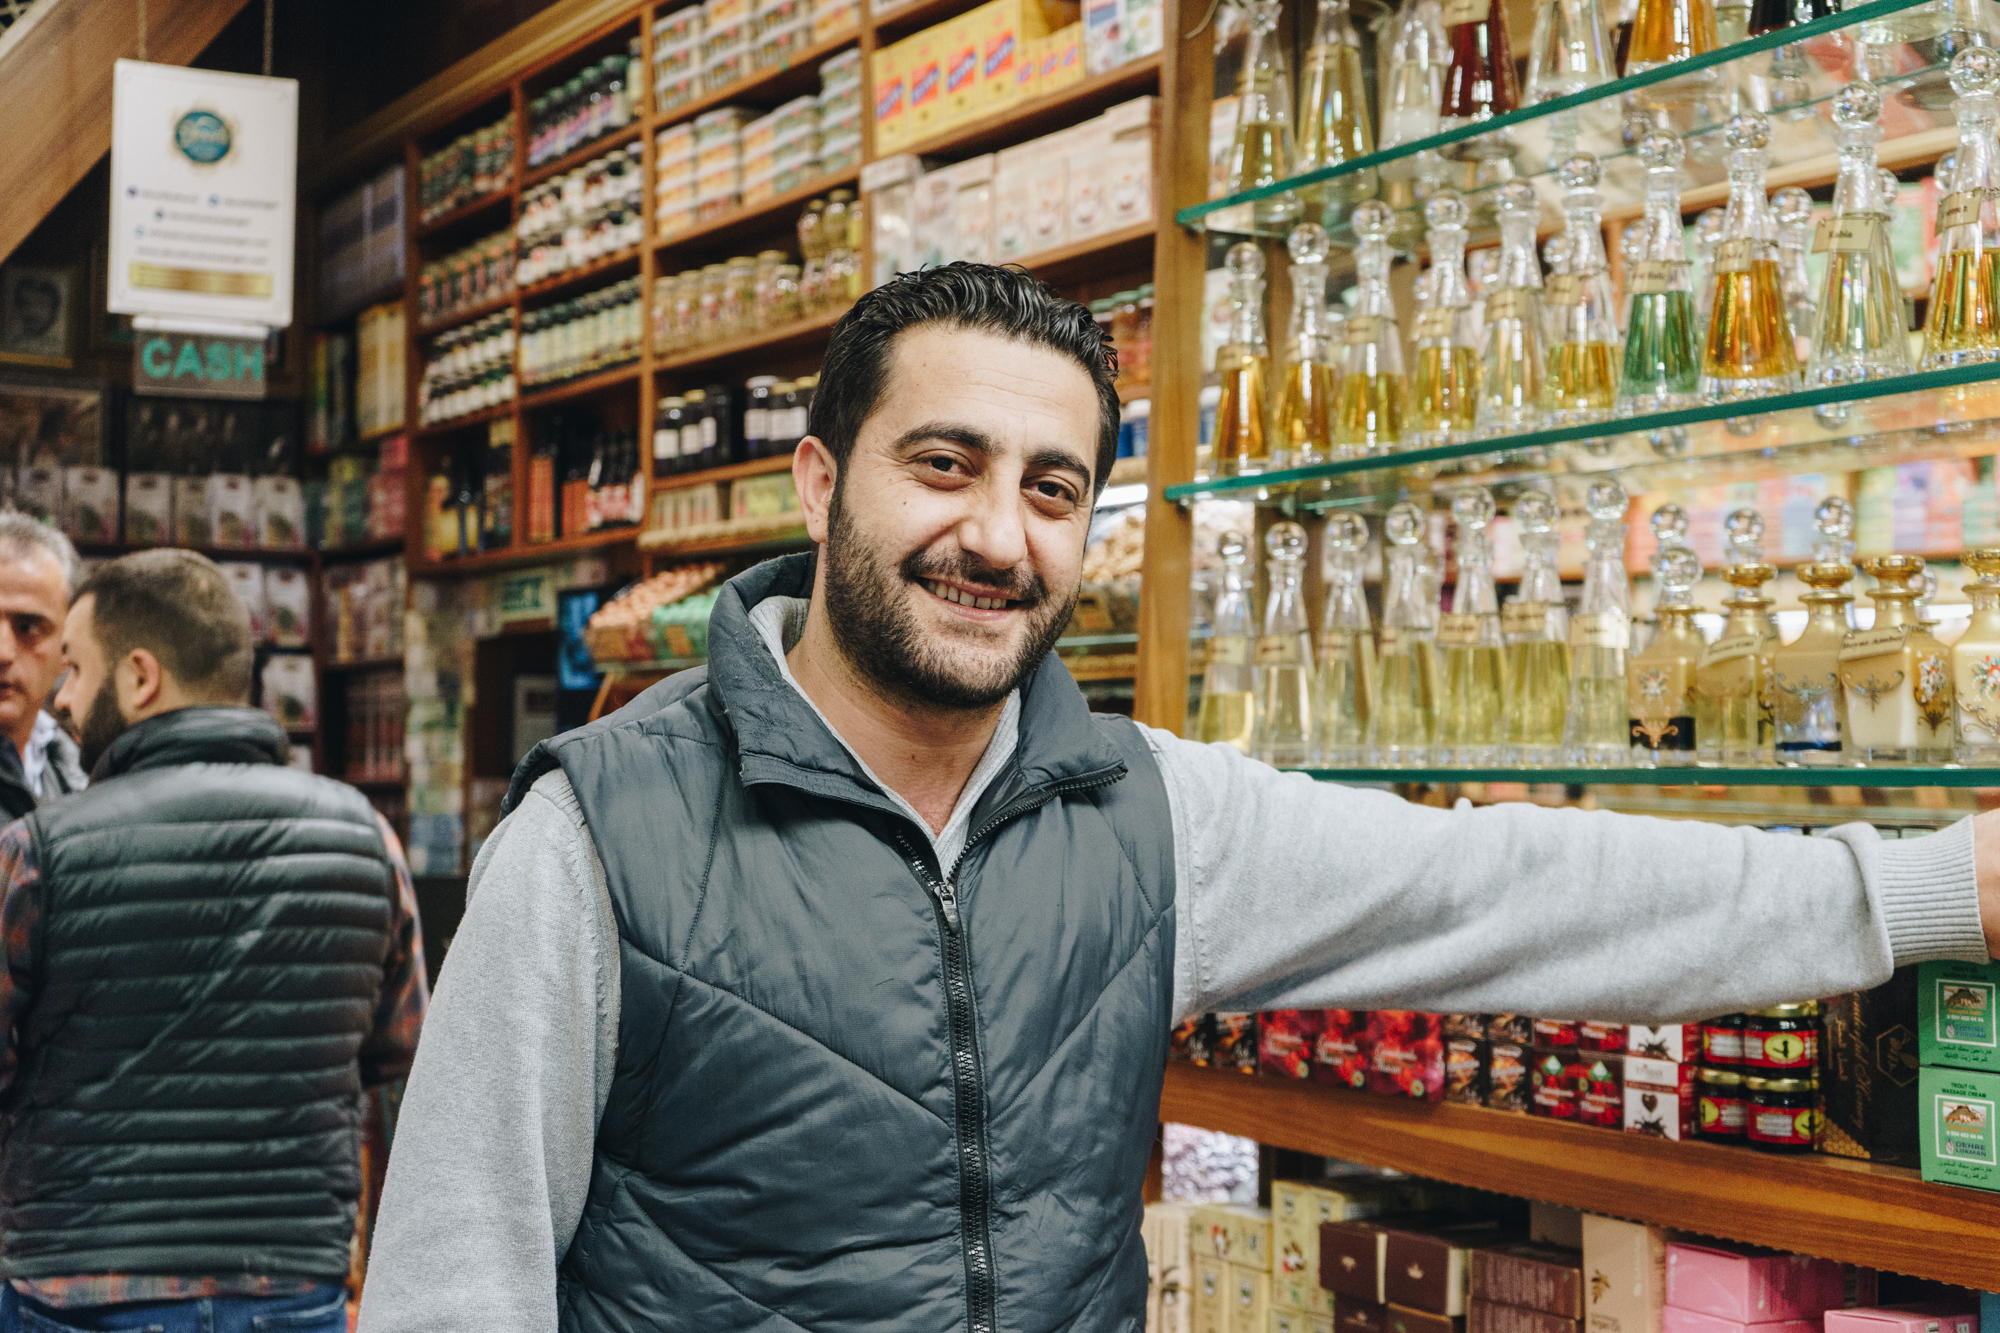 Istanbul Spice Bazaar Shop in Turkey